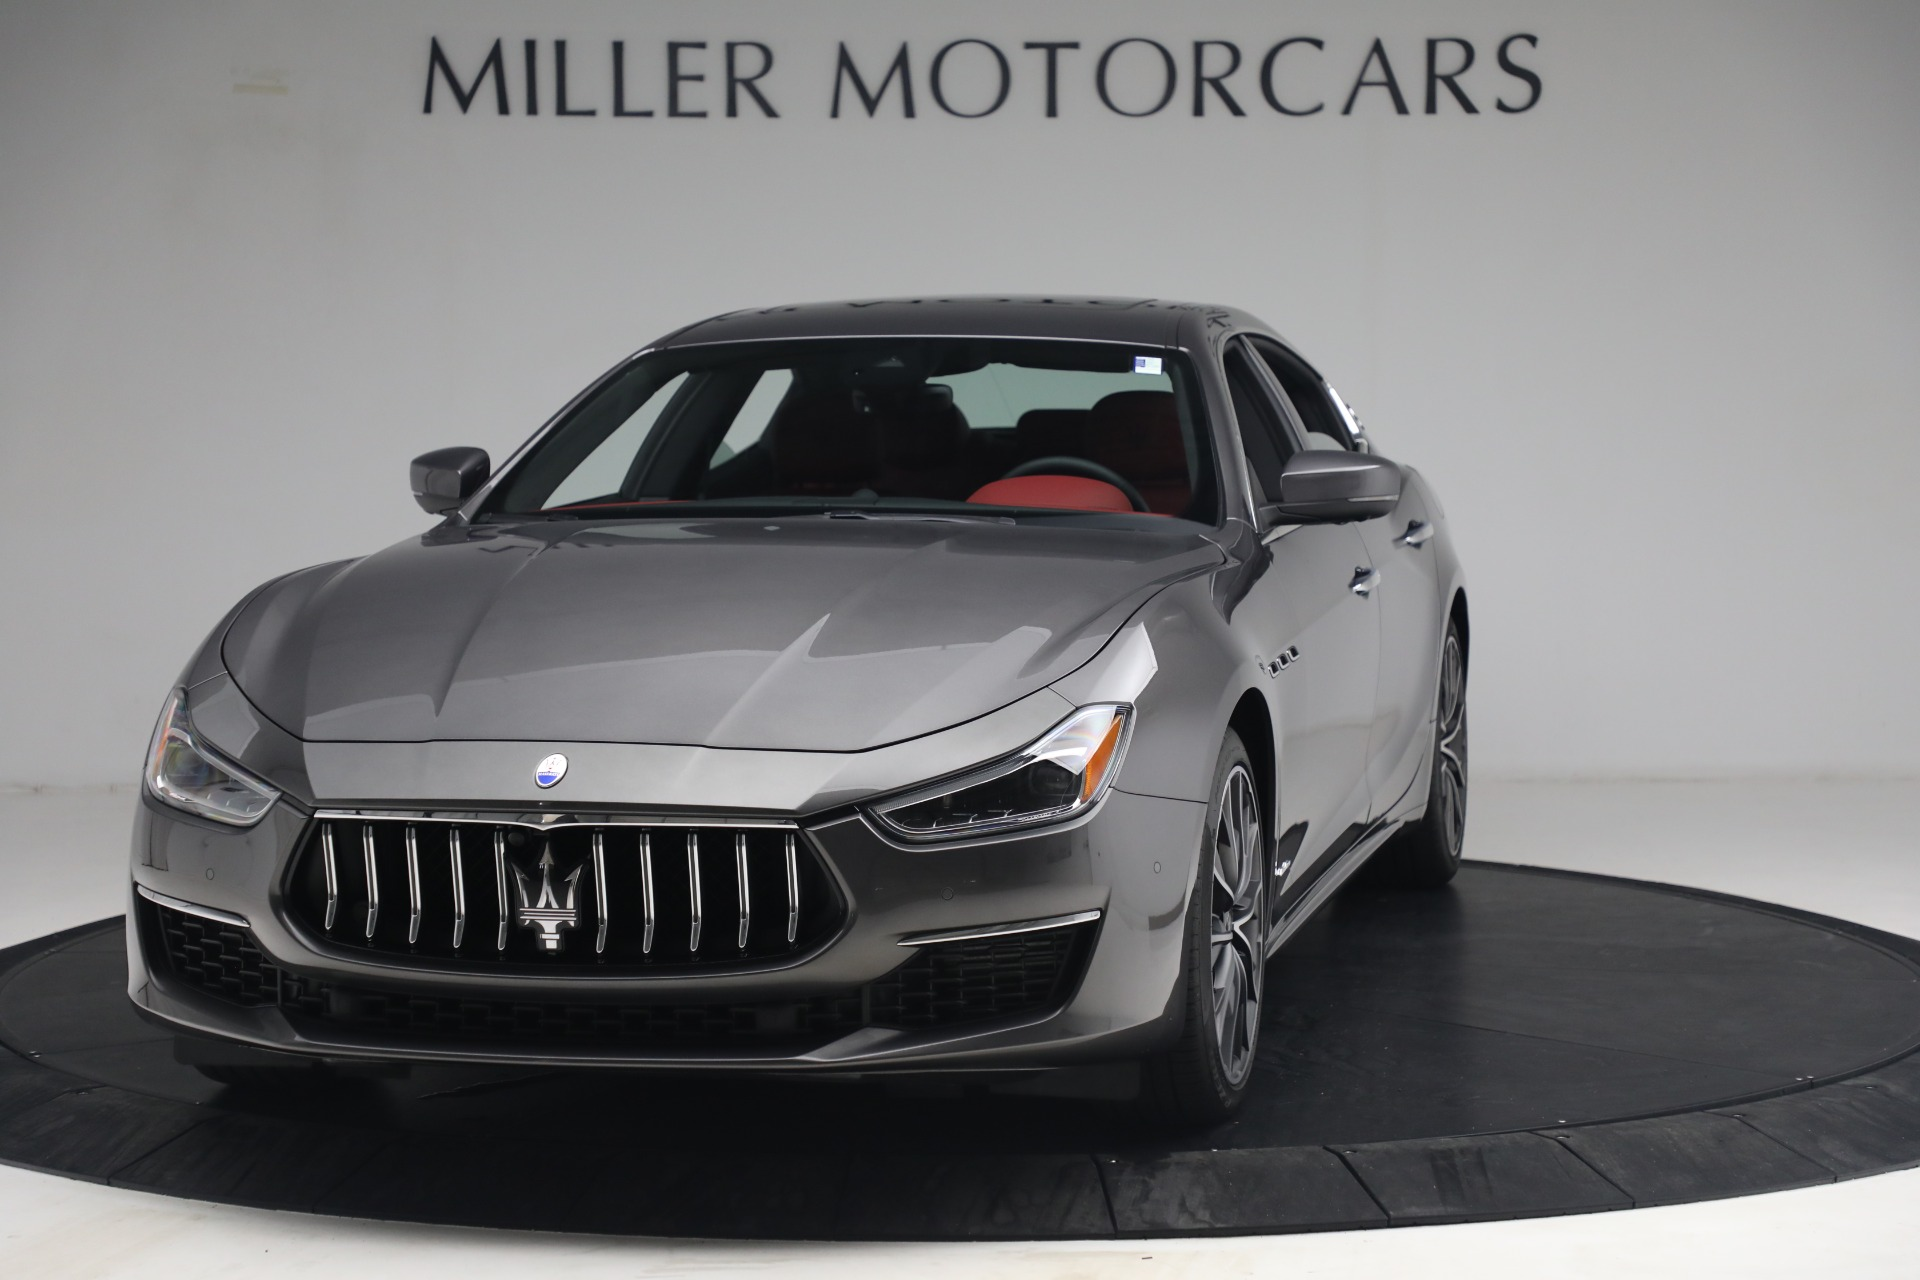 New 2021 Maserati Ghibli SQ4 GranLusso | Greenwich, CT